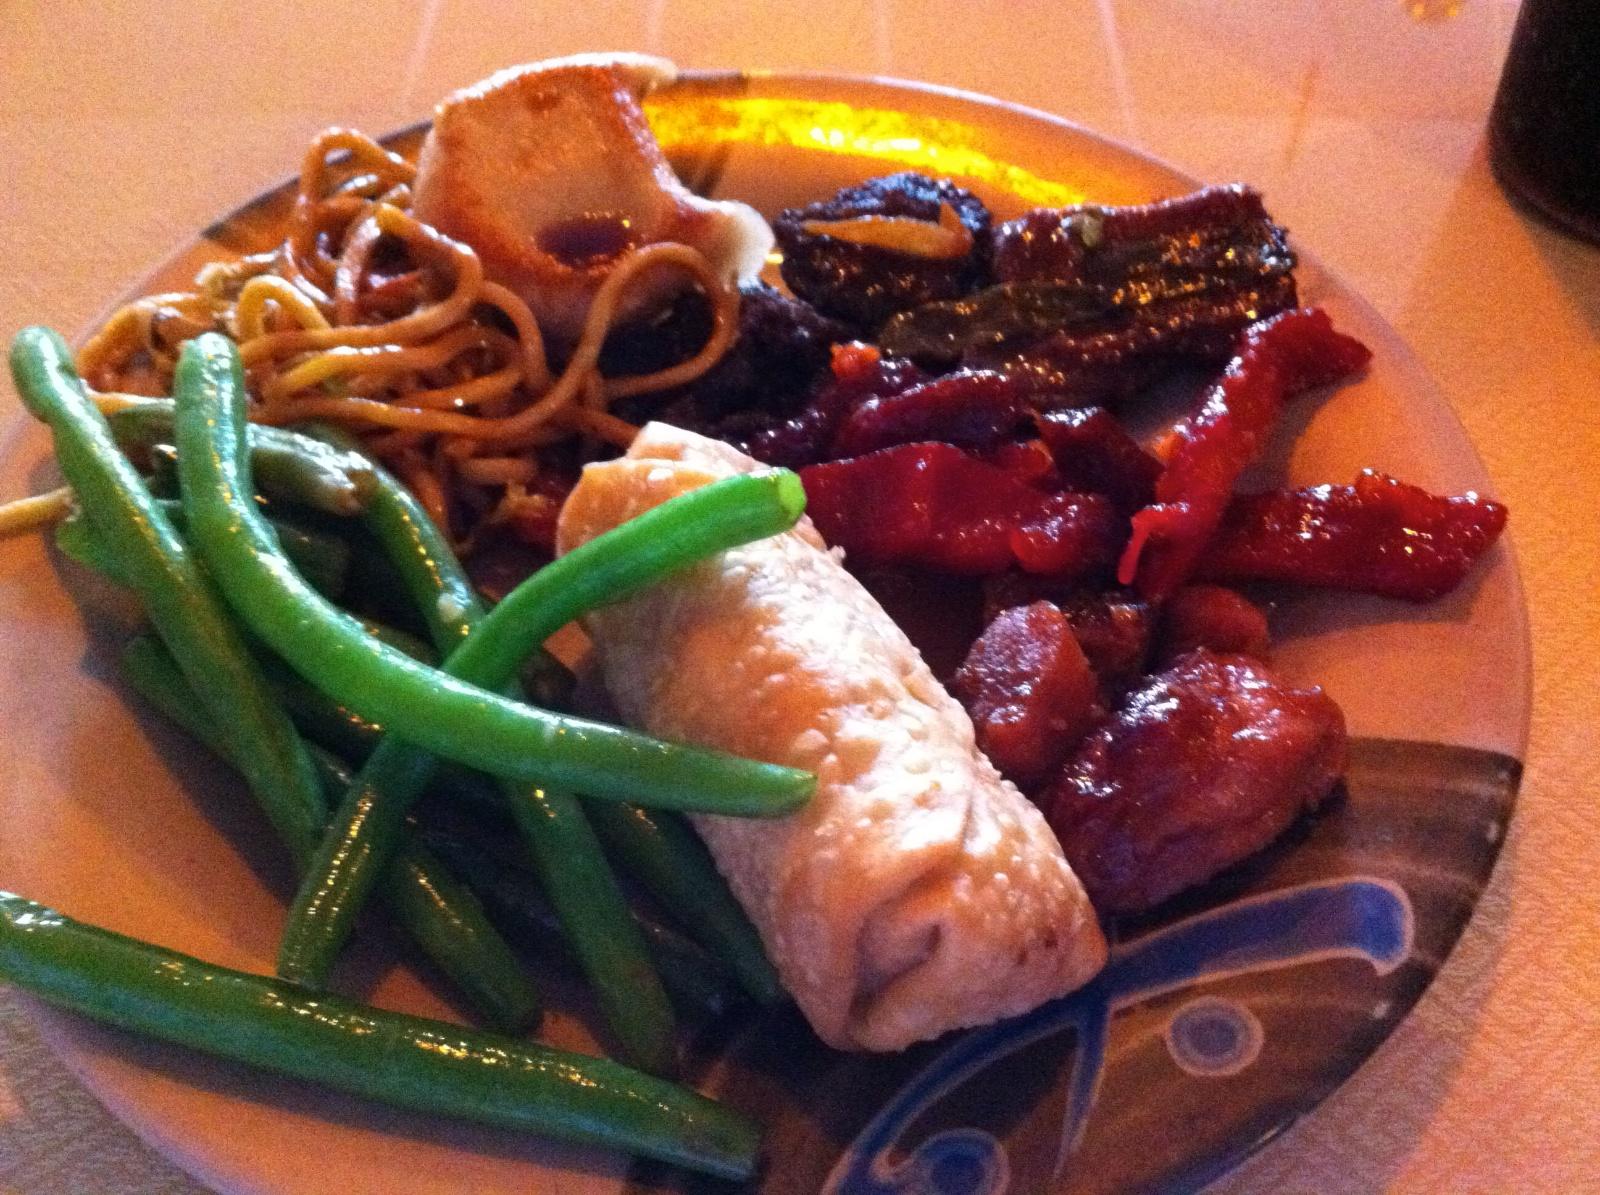 http://blog.rickk.com/food/2011/08/14/ate.2011.08.14.d.jpg